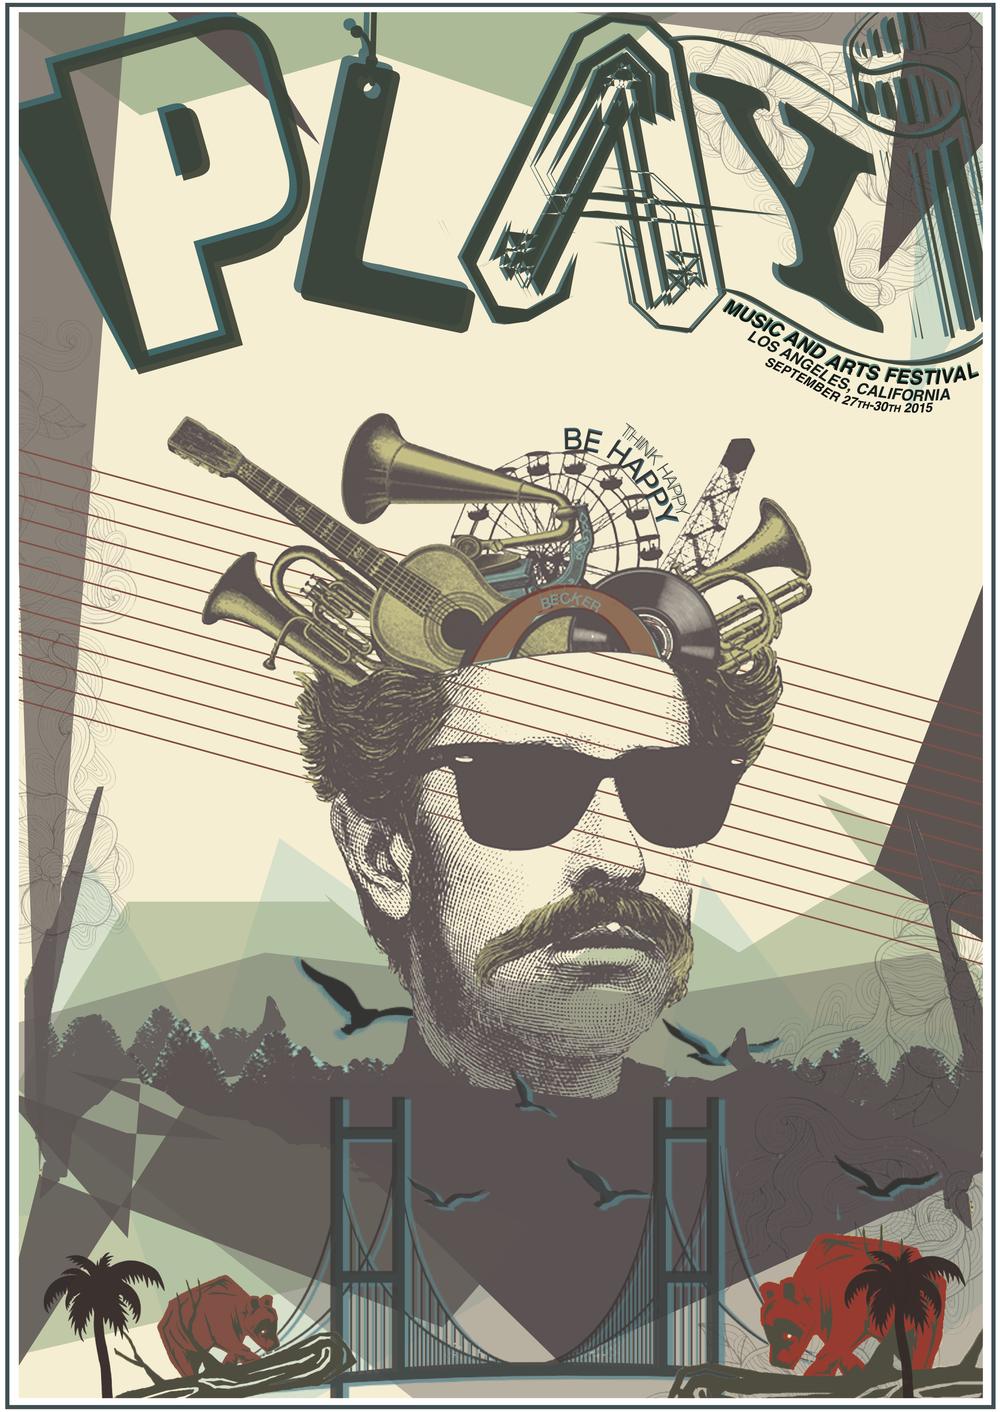 Portfolio Piece, 20 Things Play Music Festival Poster